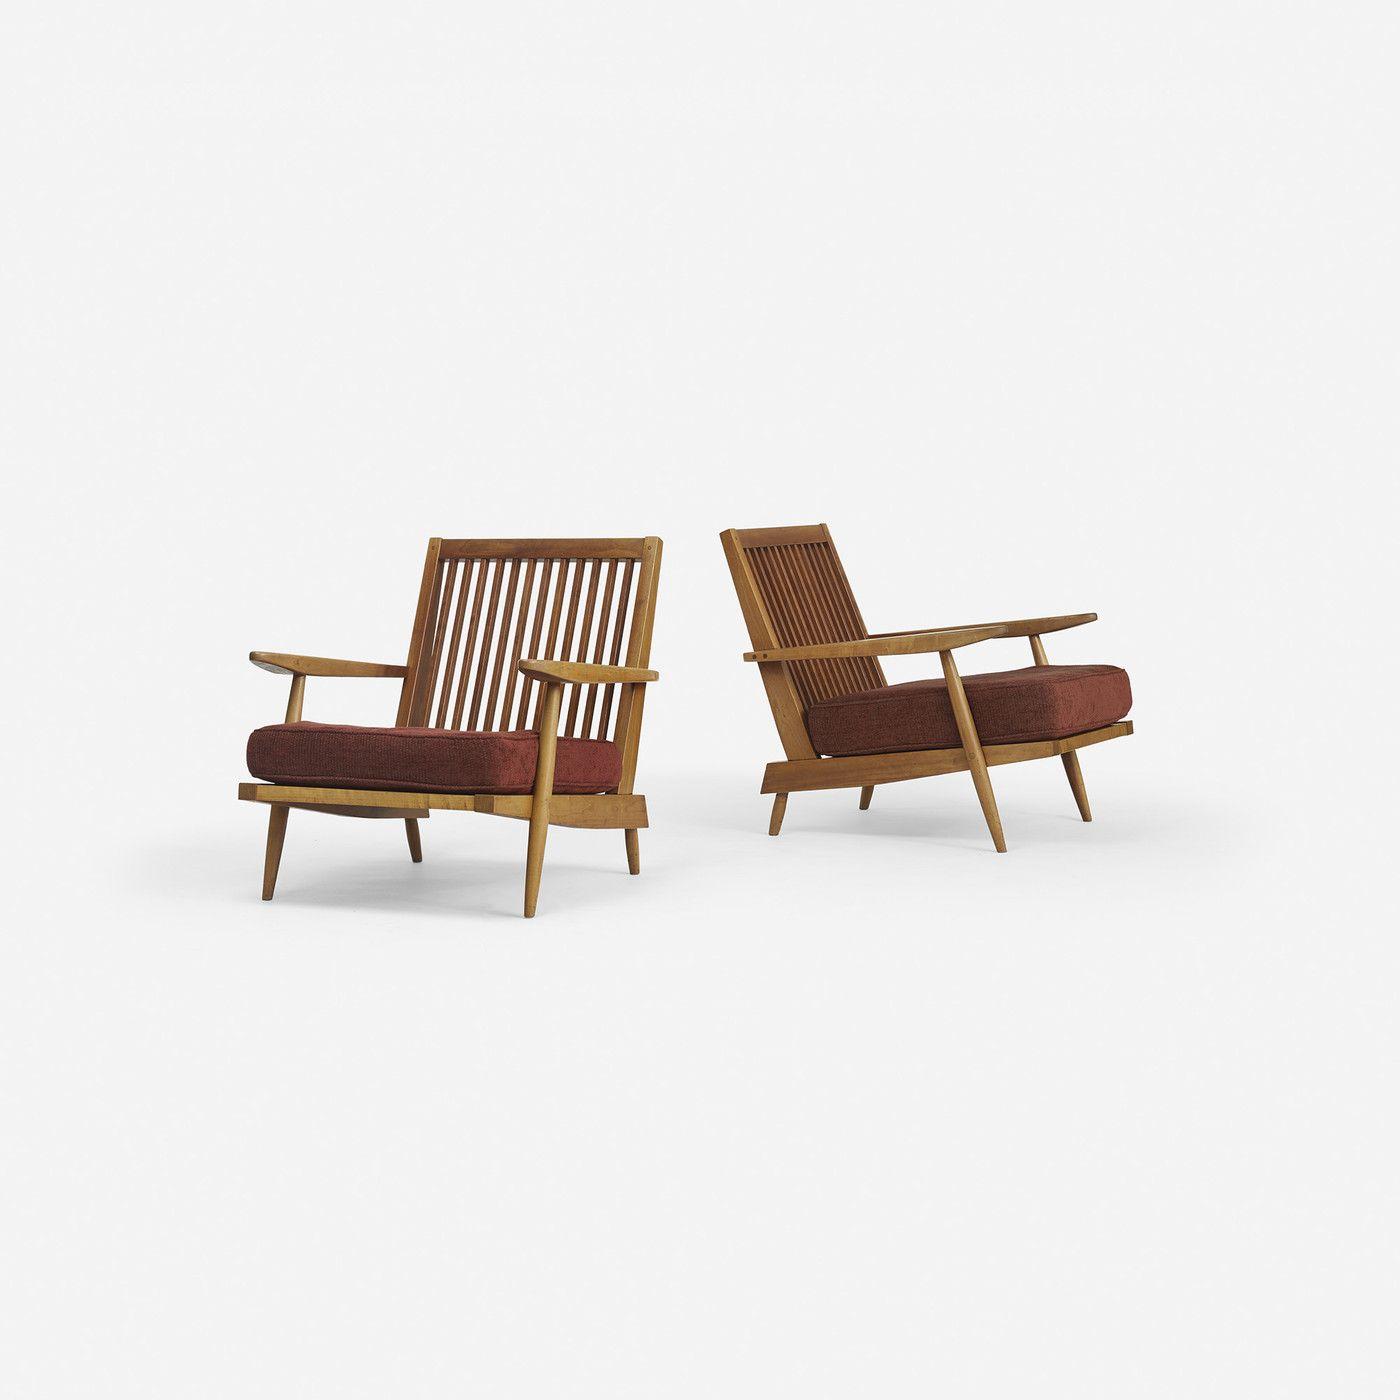 GEORGE NAKASHIMA Cushion Chairs with Arms, pair  USA, c. 1960 cherry, walnut, upholstery s11